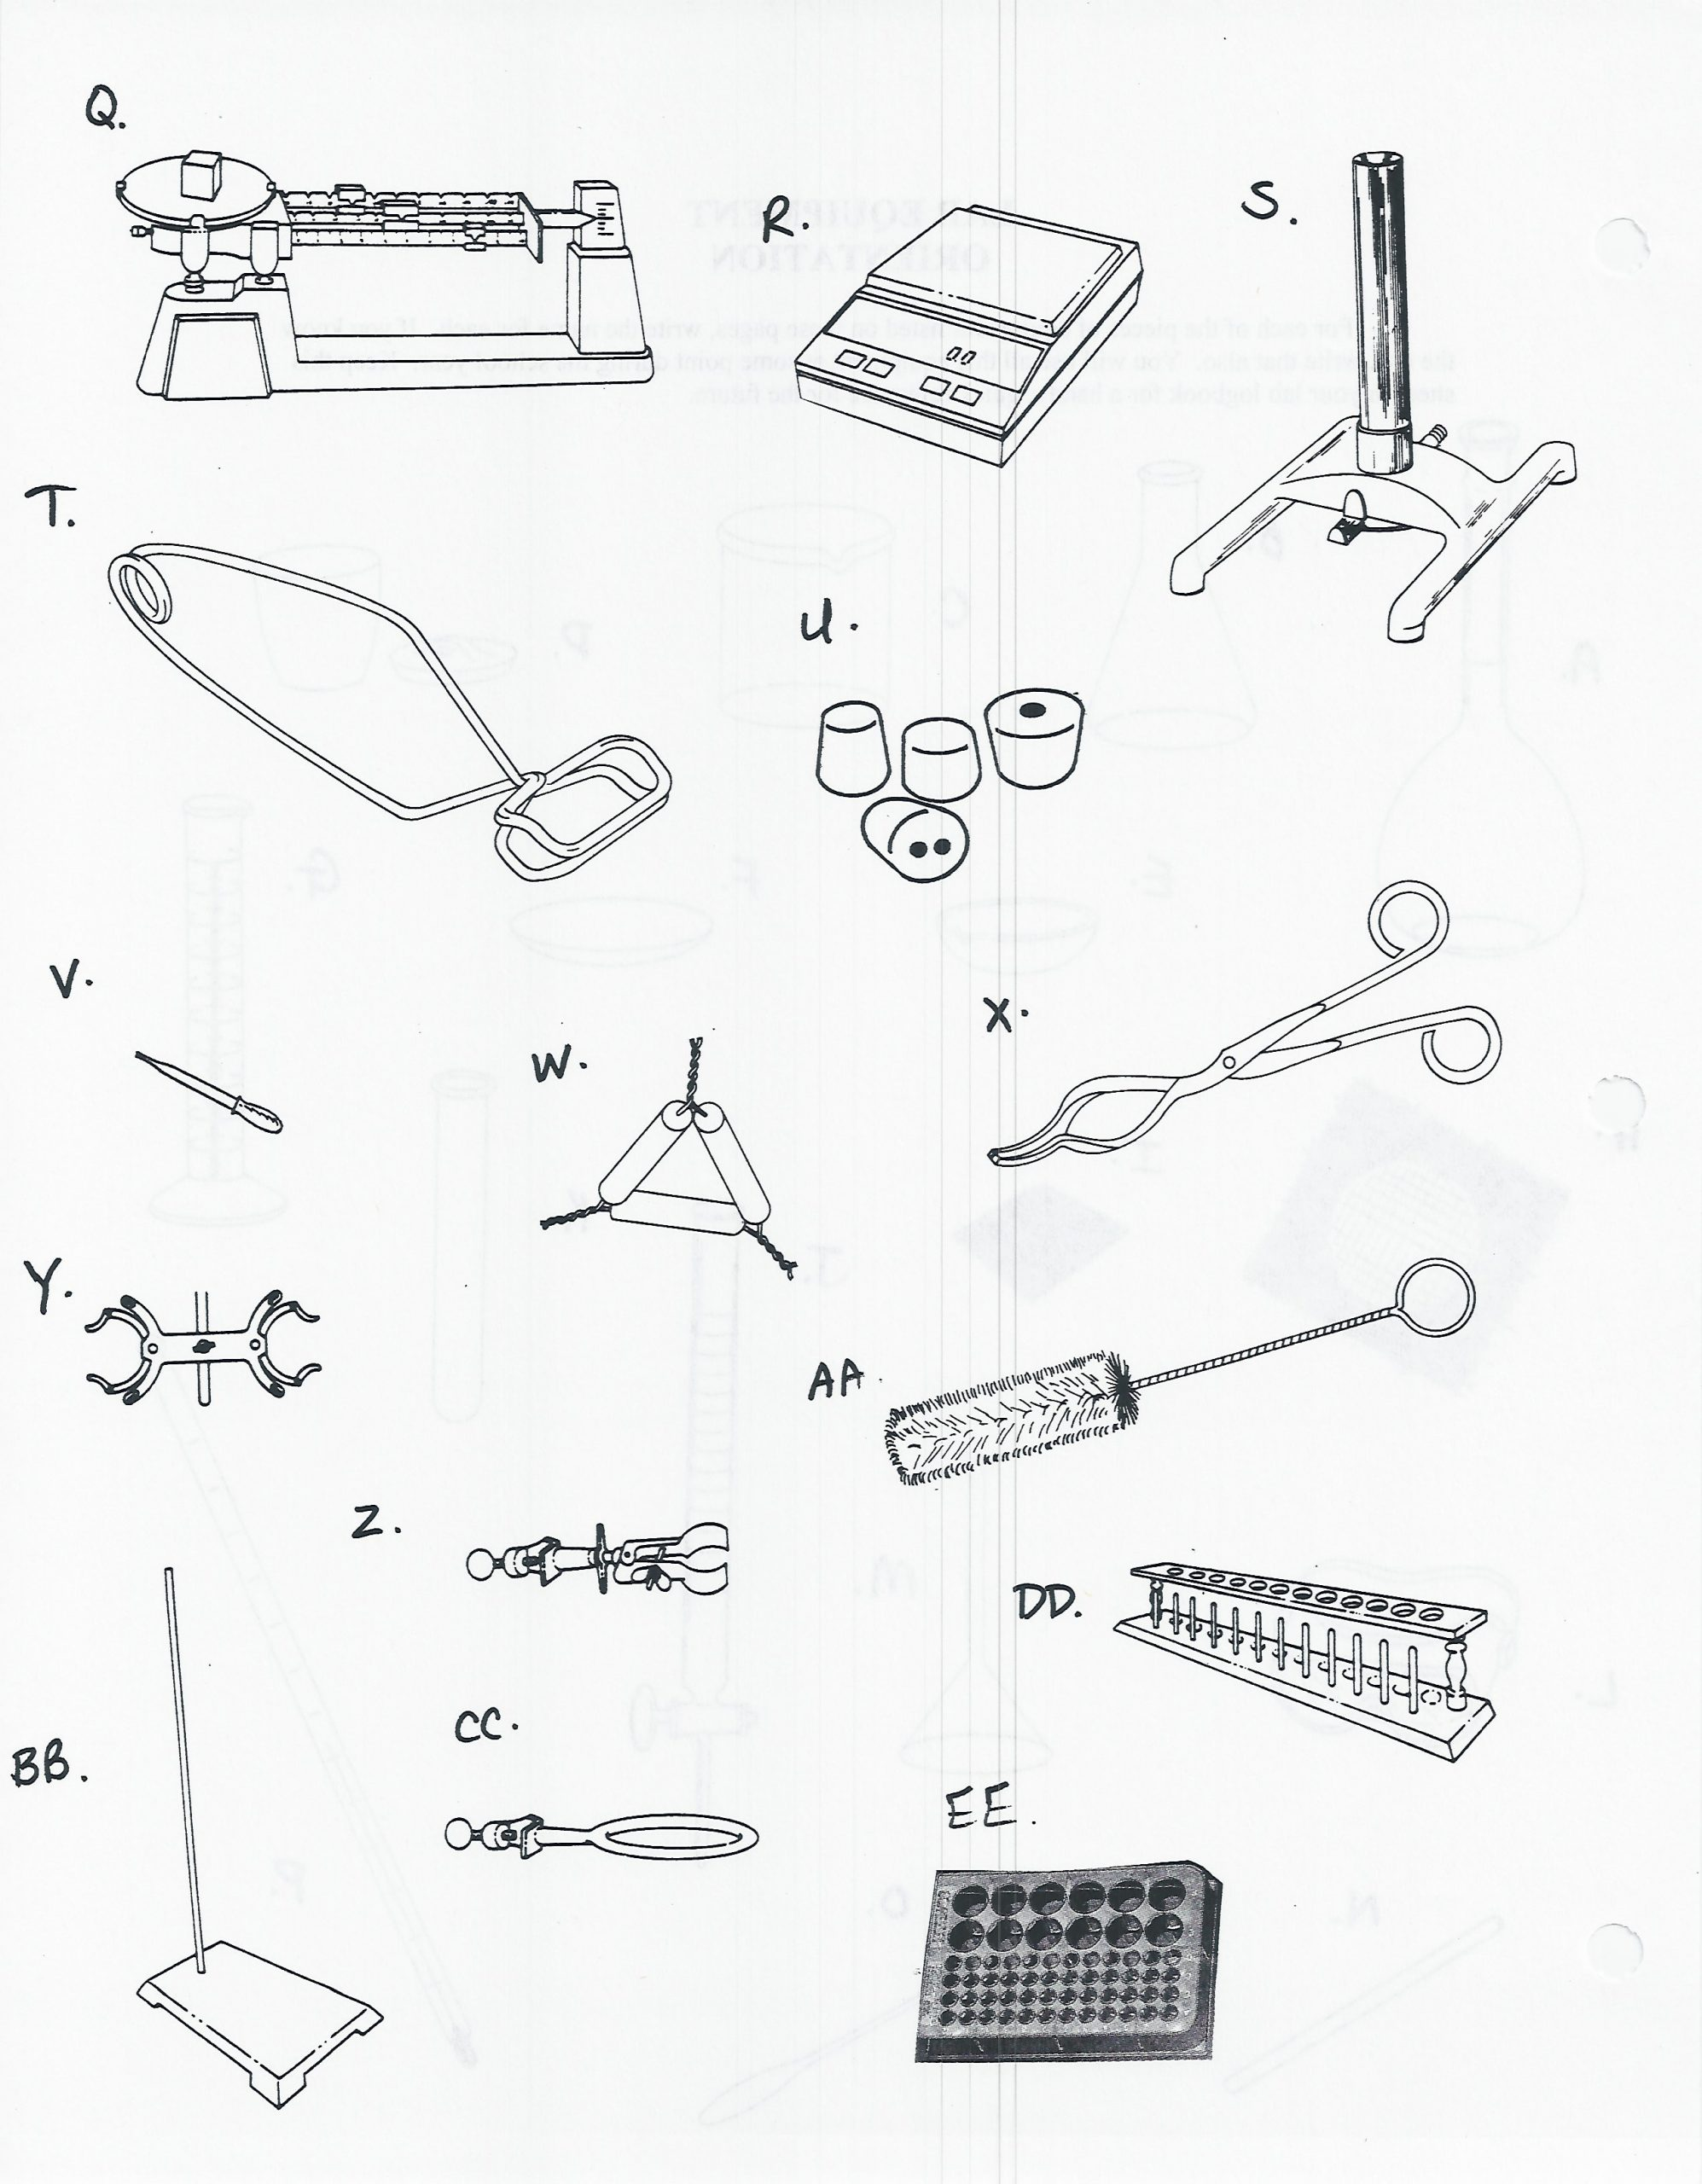 Lab Equipment Worksheet Answer